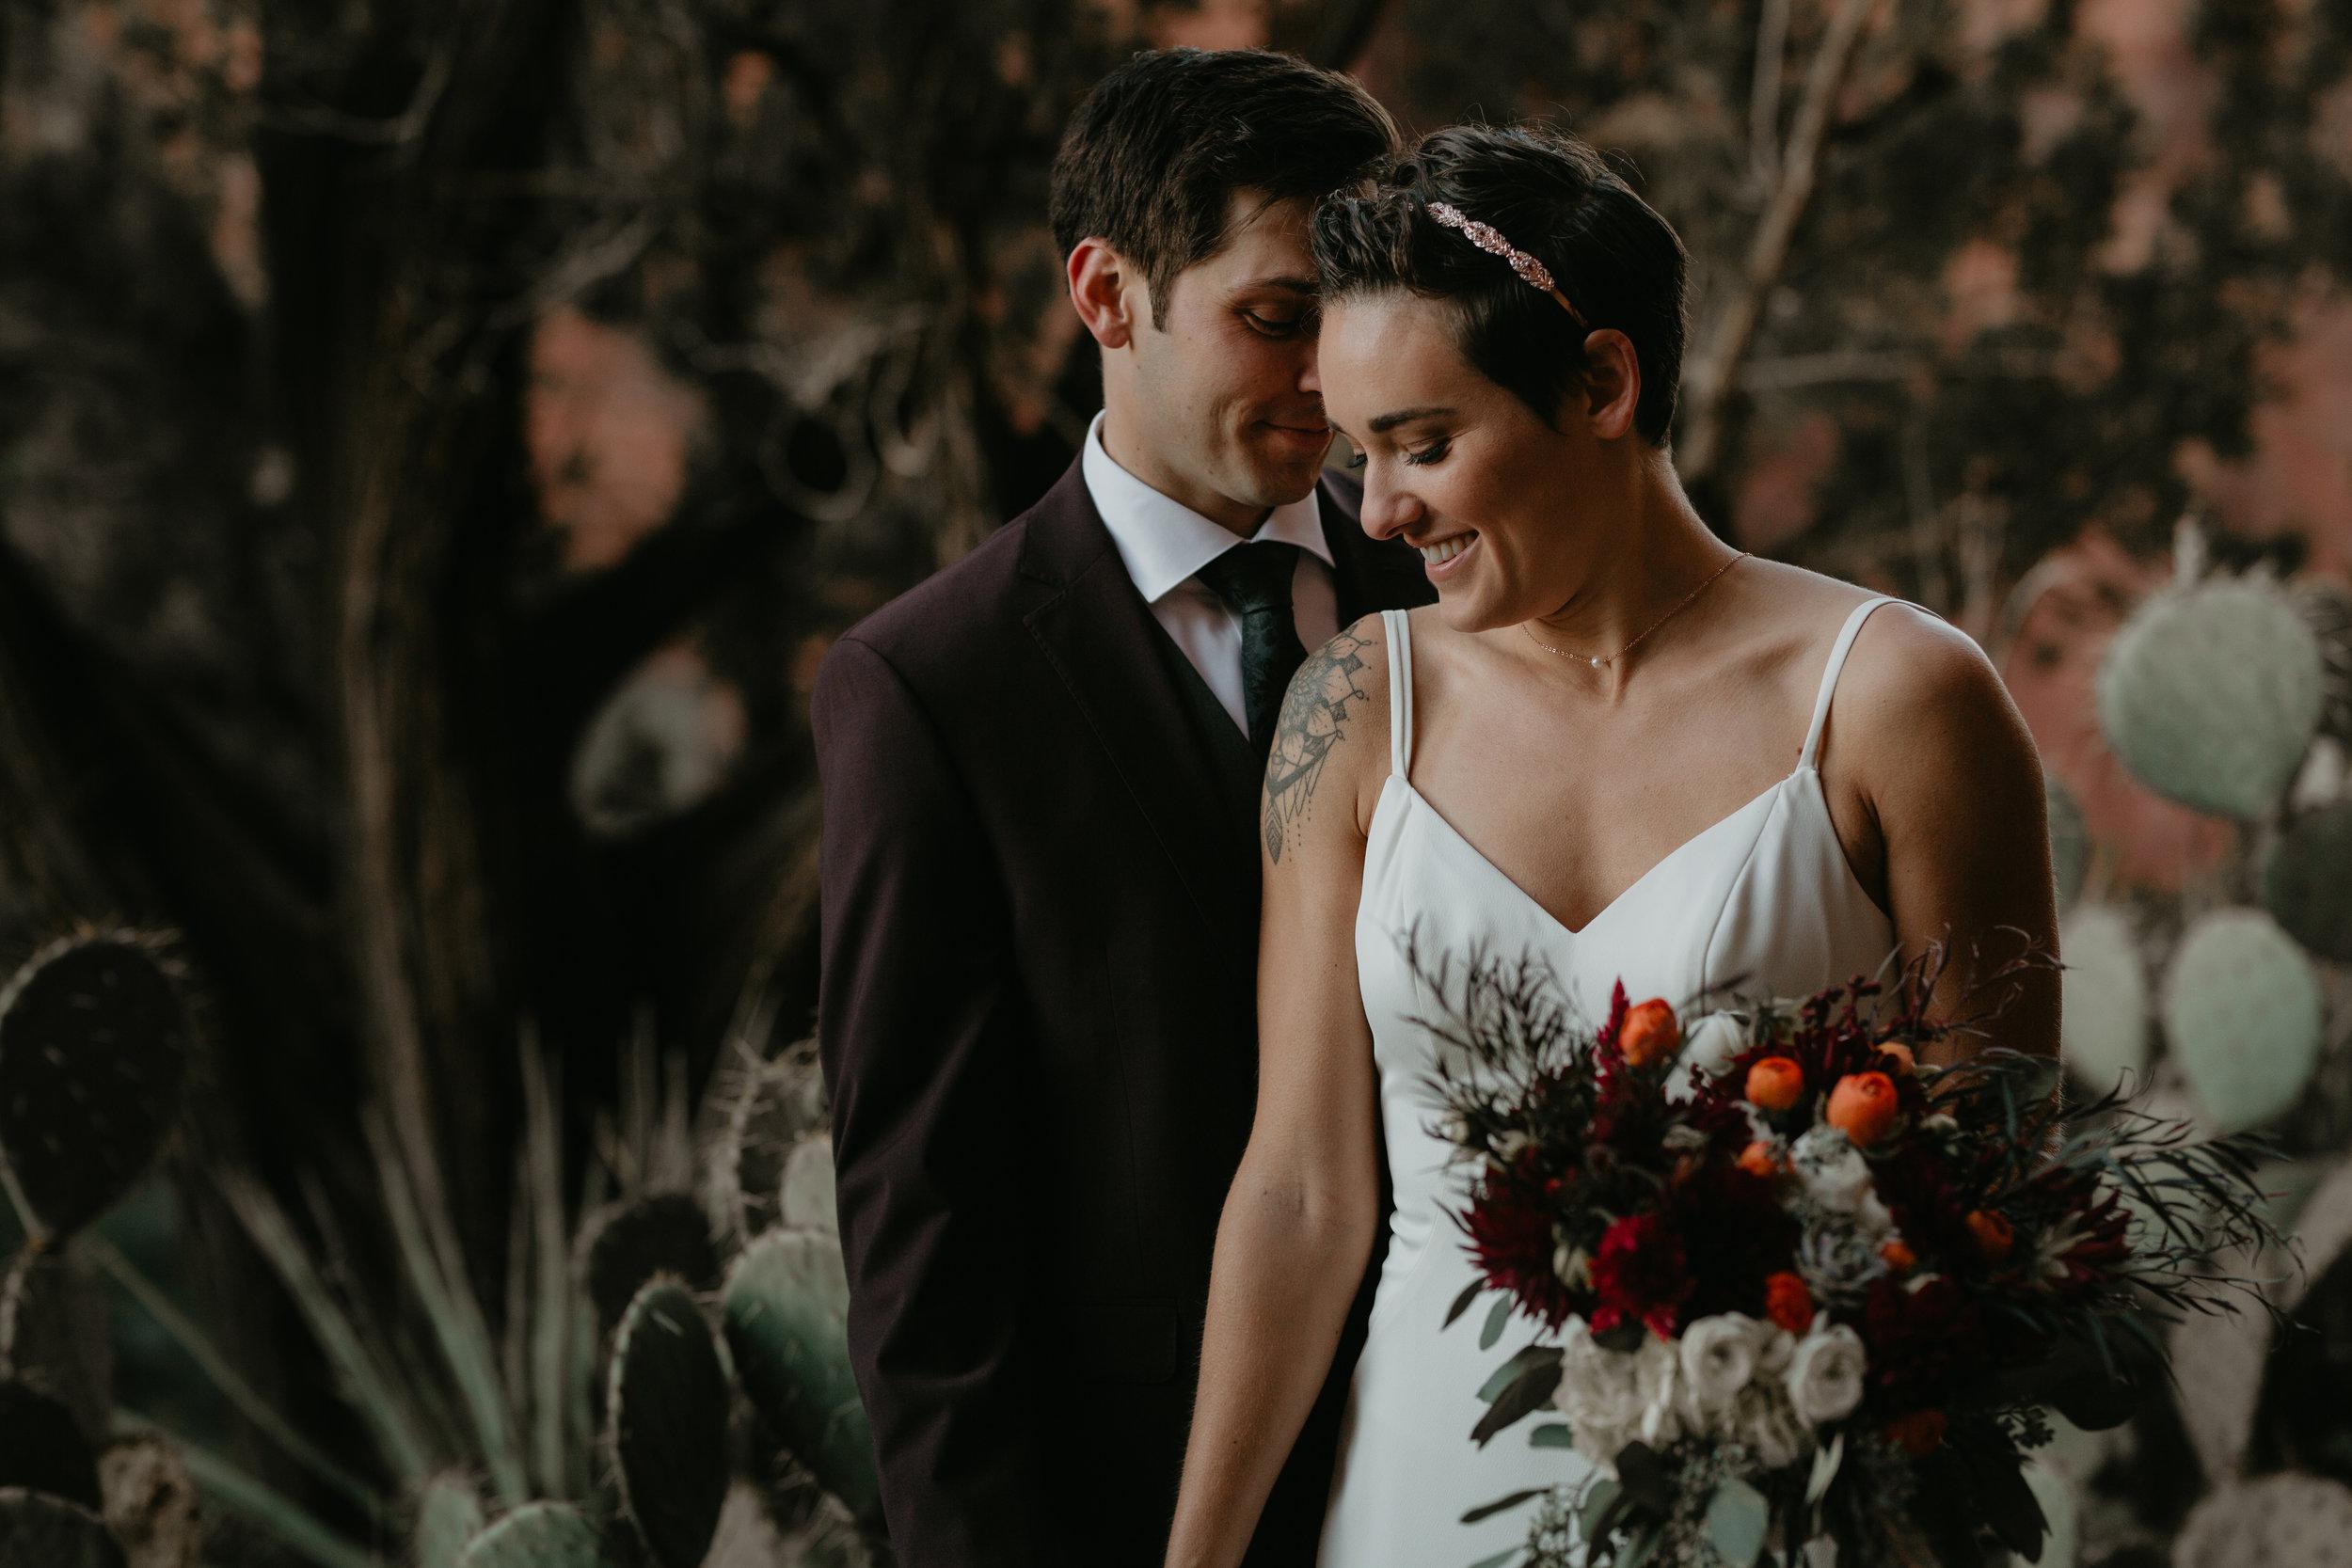 nicole-daacke-photography-sedona-arizona-destination-elopement-wedding-photographer-catherdral-rock-hiking-elopement-sedona-river-elopement-photos-desert-rock-wedding-photographer-laid-back-spontaneous-elopement-28.jpg